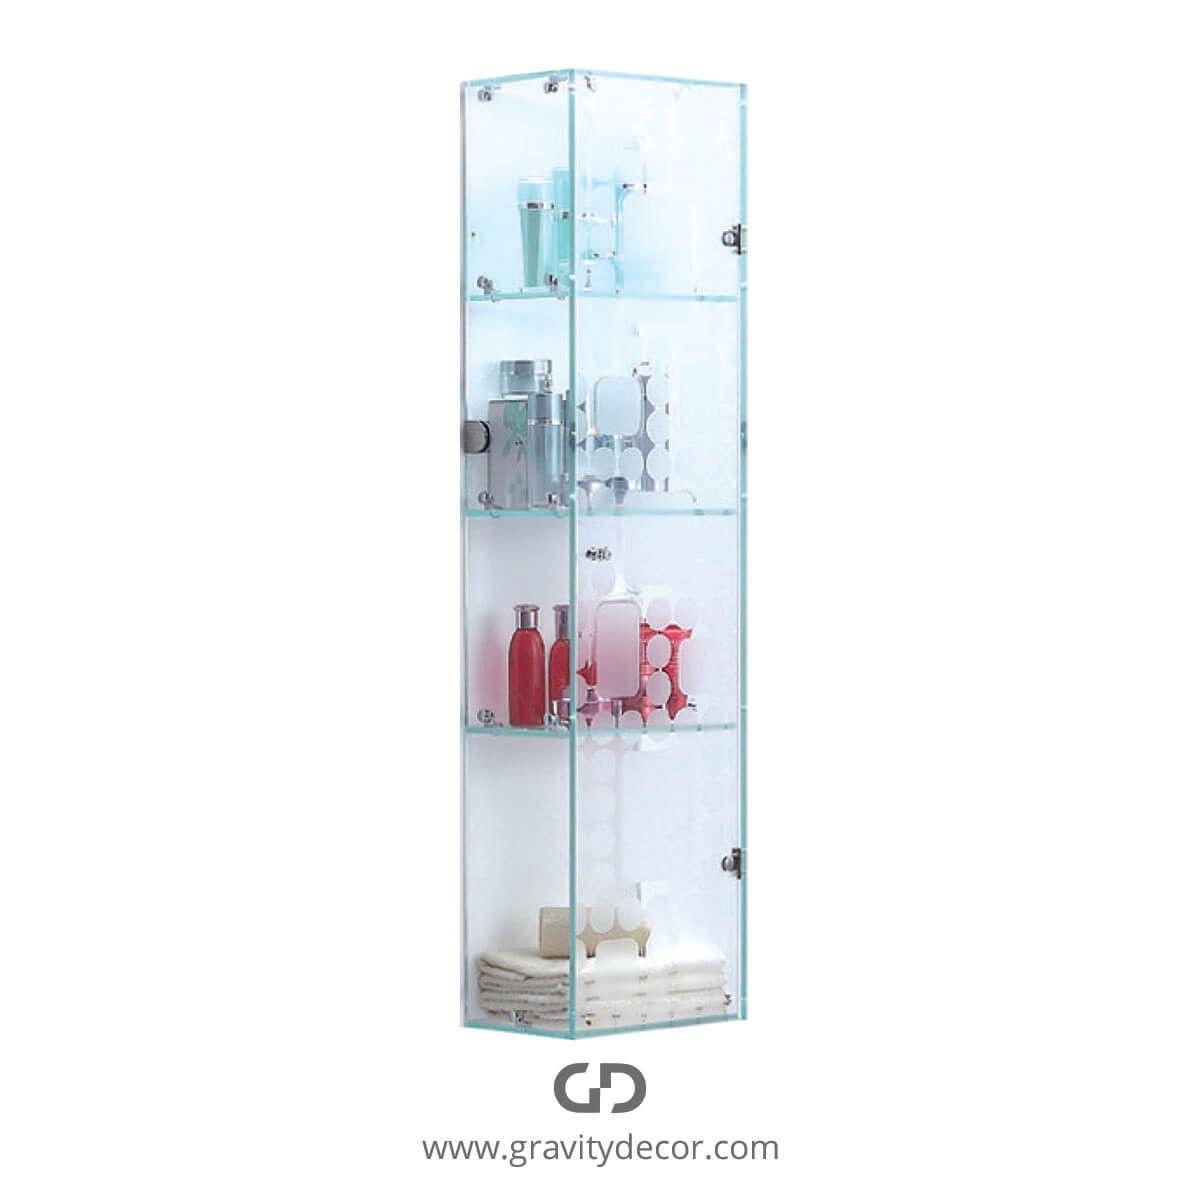 34+ Wall mounted glass bathroom cabinet type